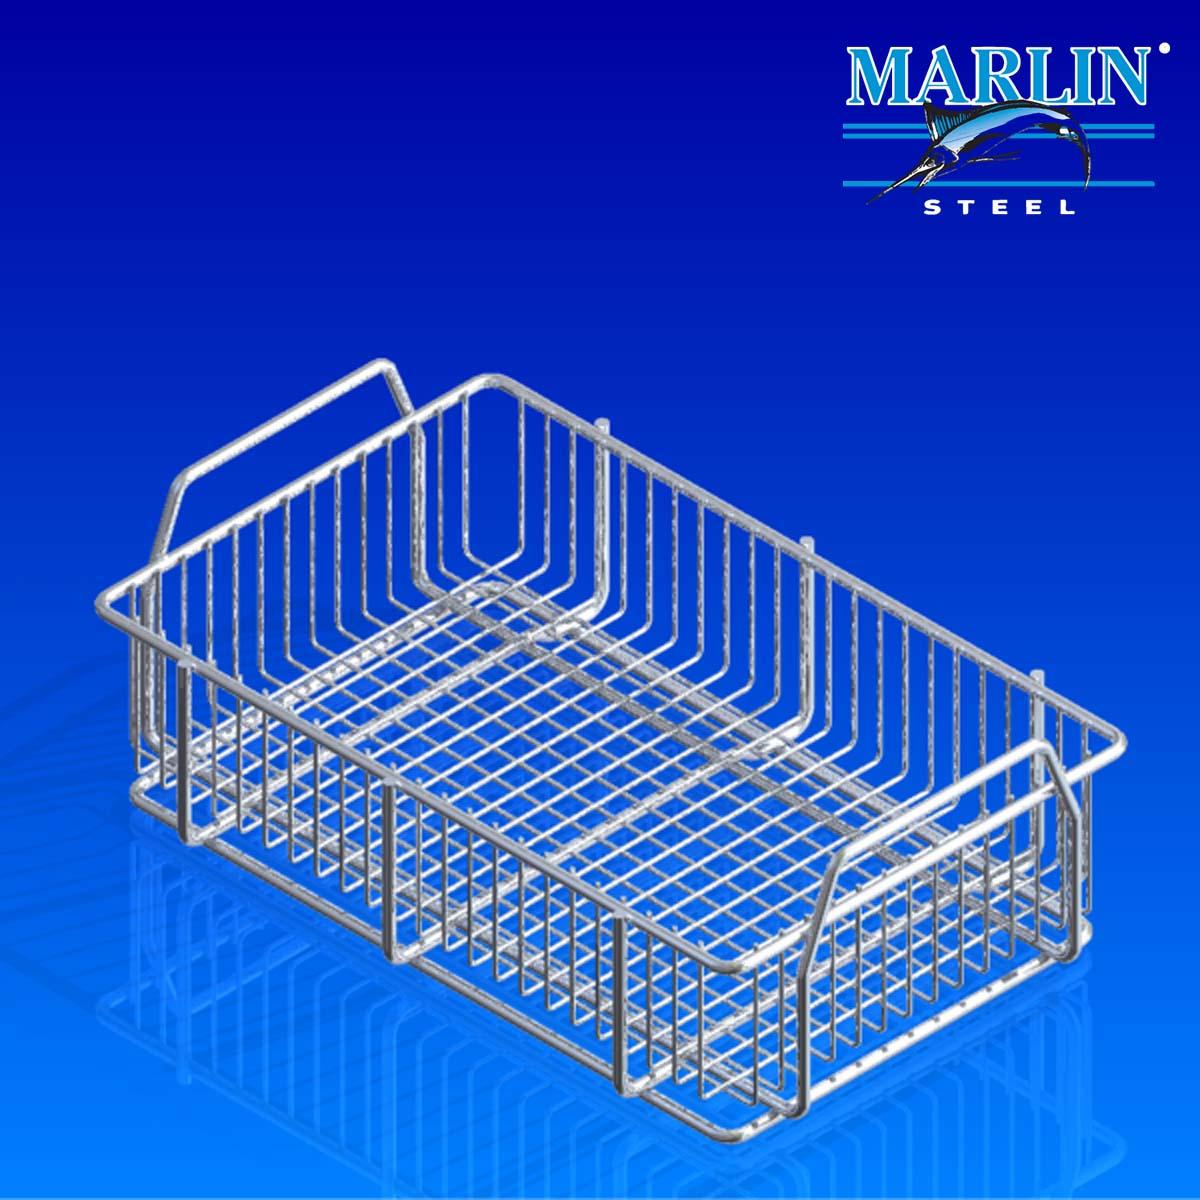 Marlin Steel Basket with Handles 848001